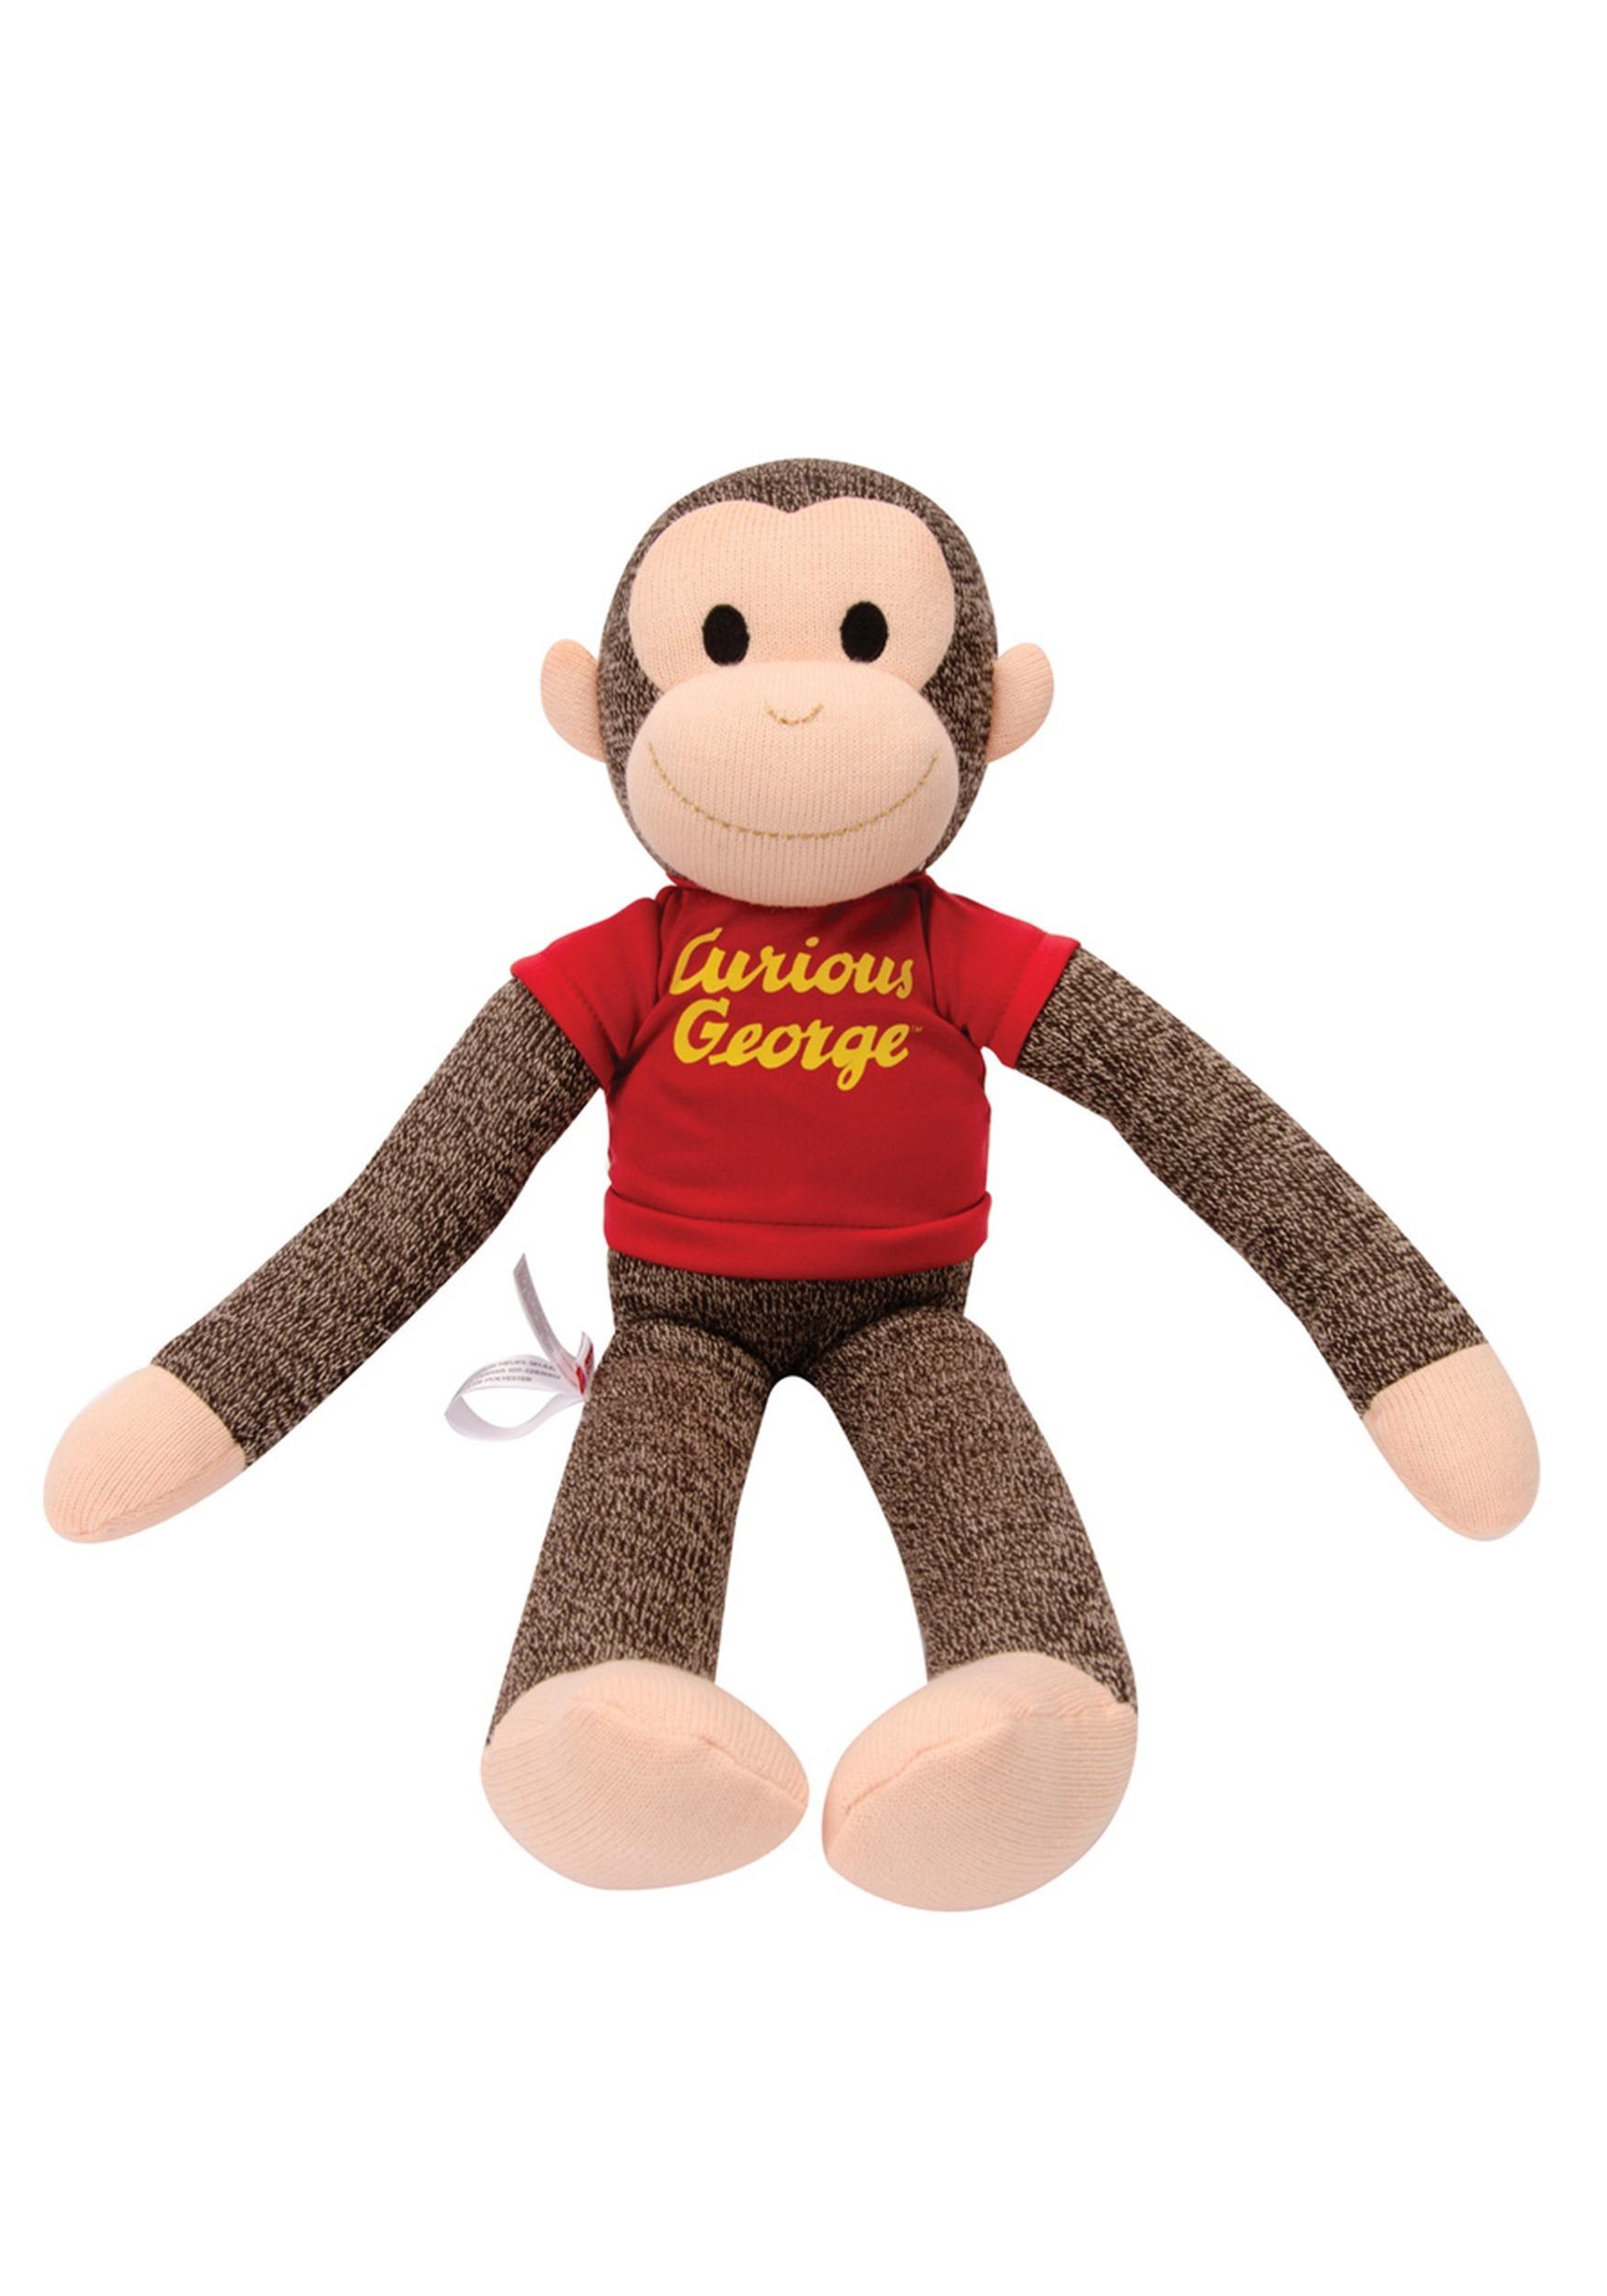 Stuffed Sock Monkey Curious George Figure